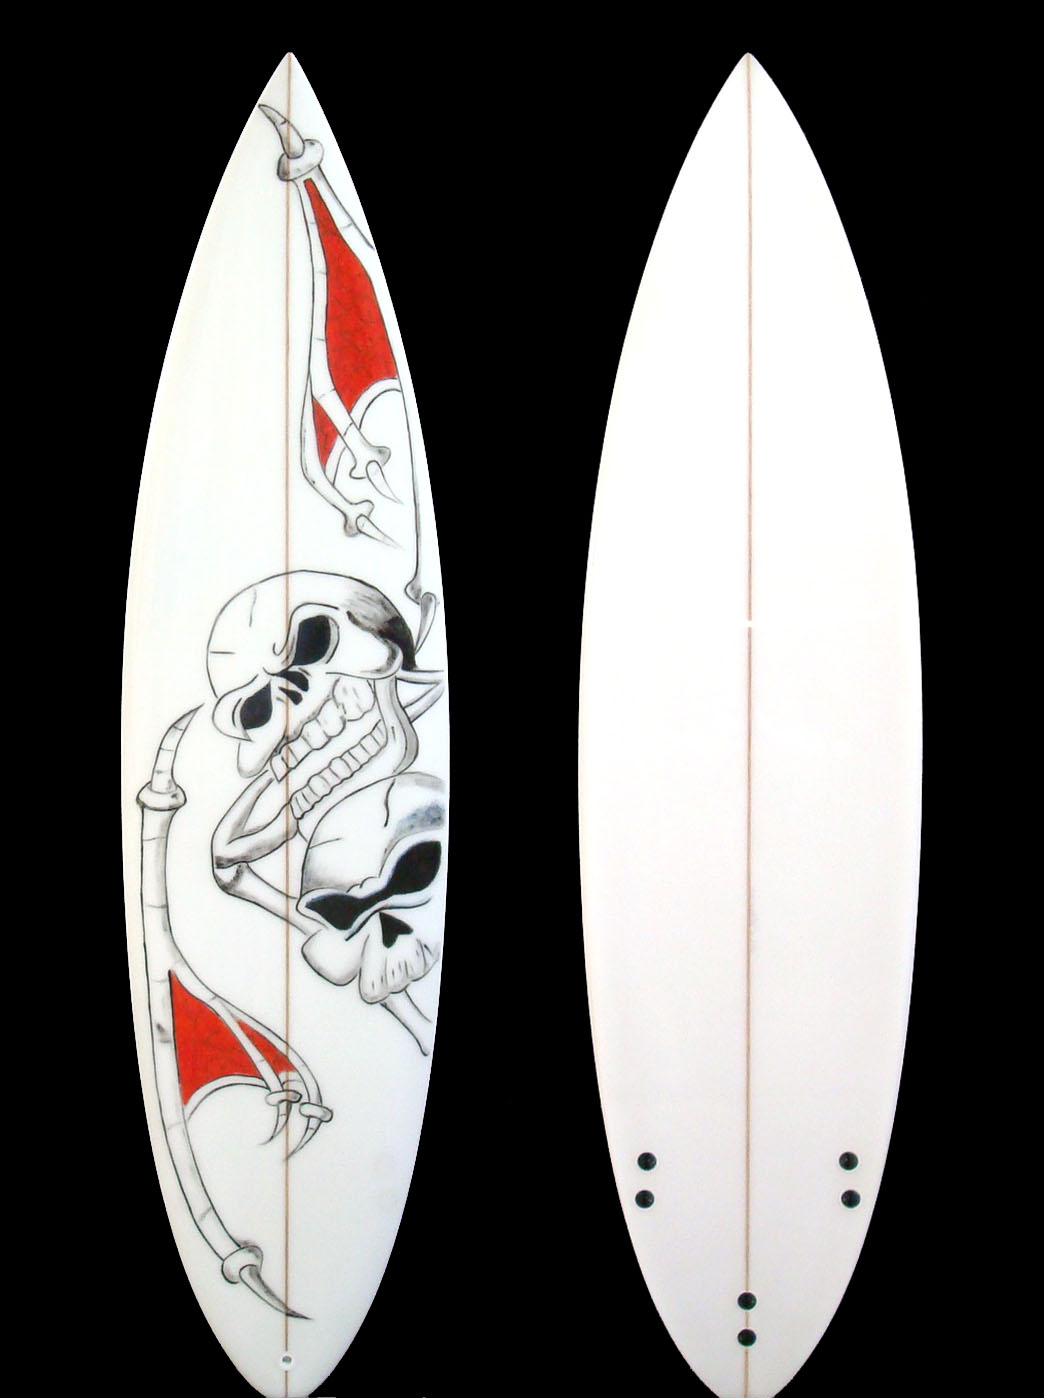 Pu tavola da surf porcellana naviga id prodotto 201928135 - Tavola da surf a motore ...